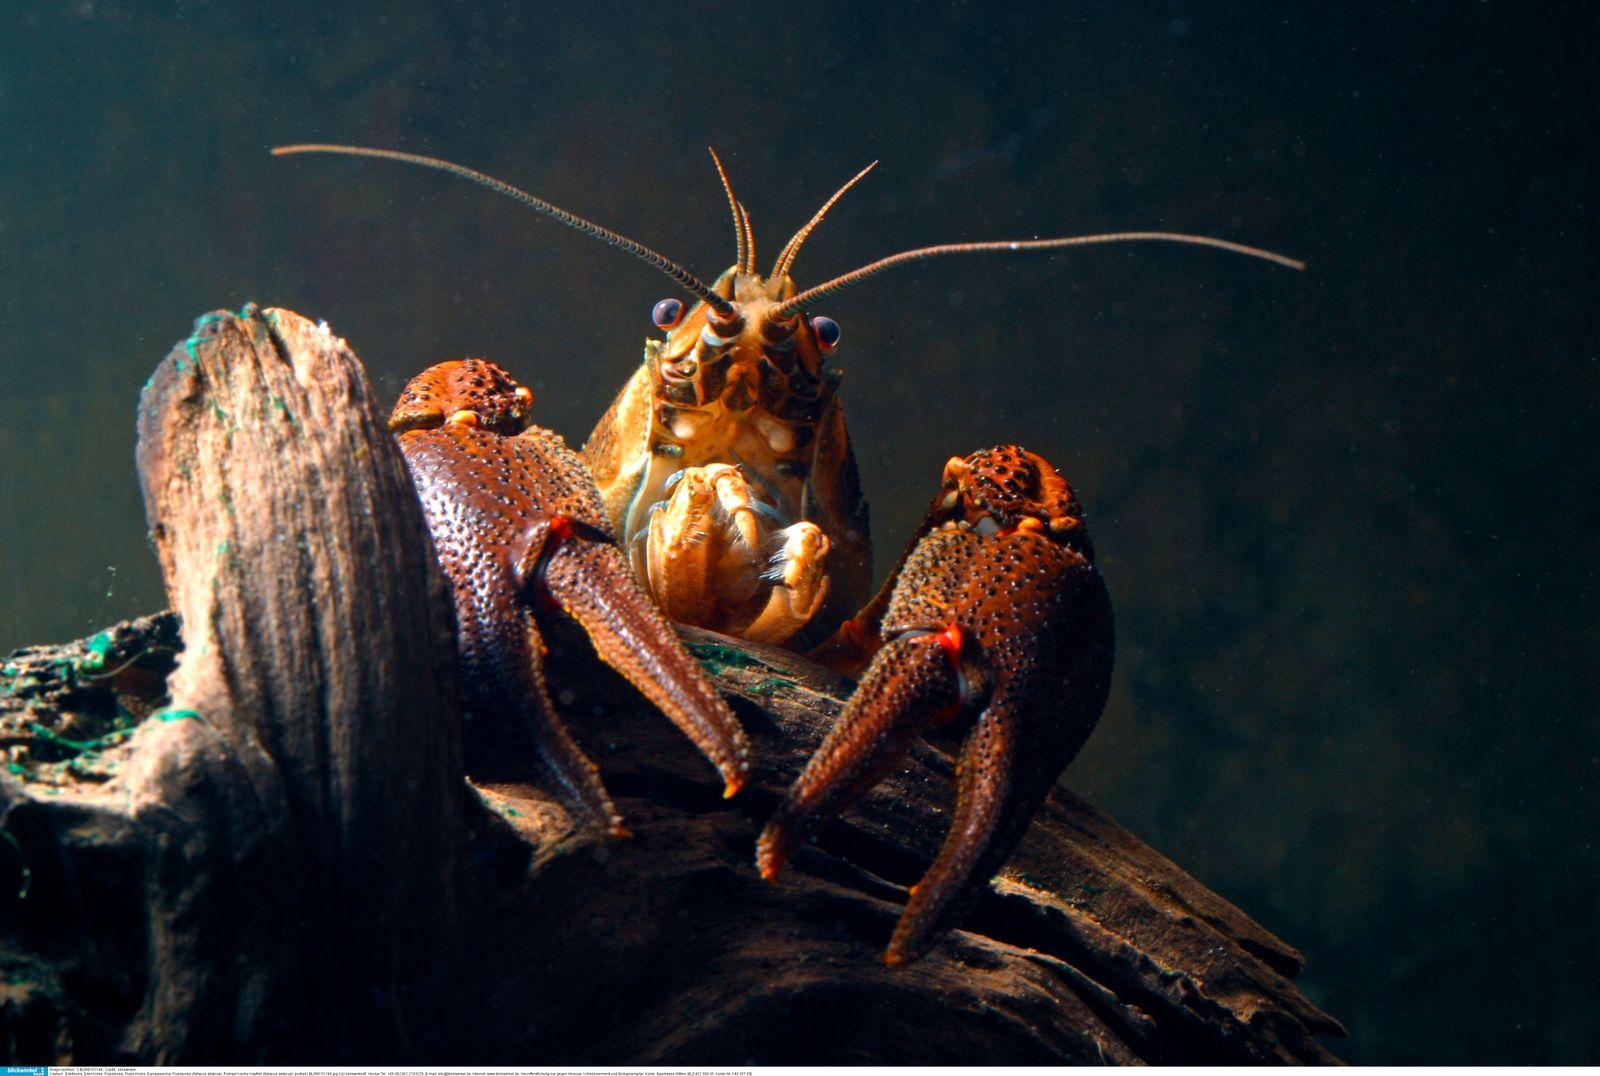 Edelkrebs, Edel-Krebs, Flusskrebs, Fluss-Krebs, Europaeischer Flusskrebs, Astacus astacus, noble crayfish